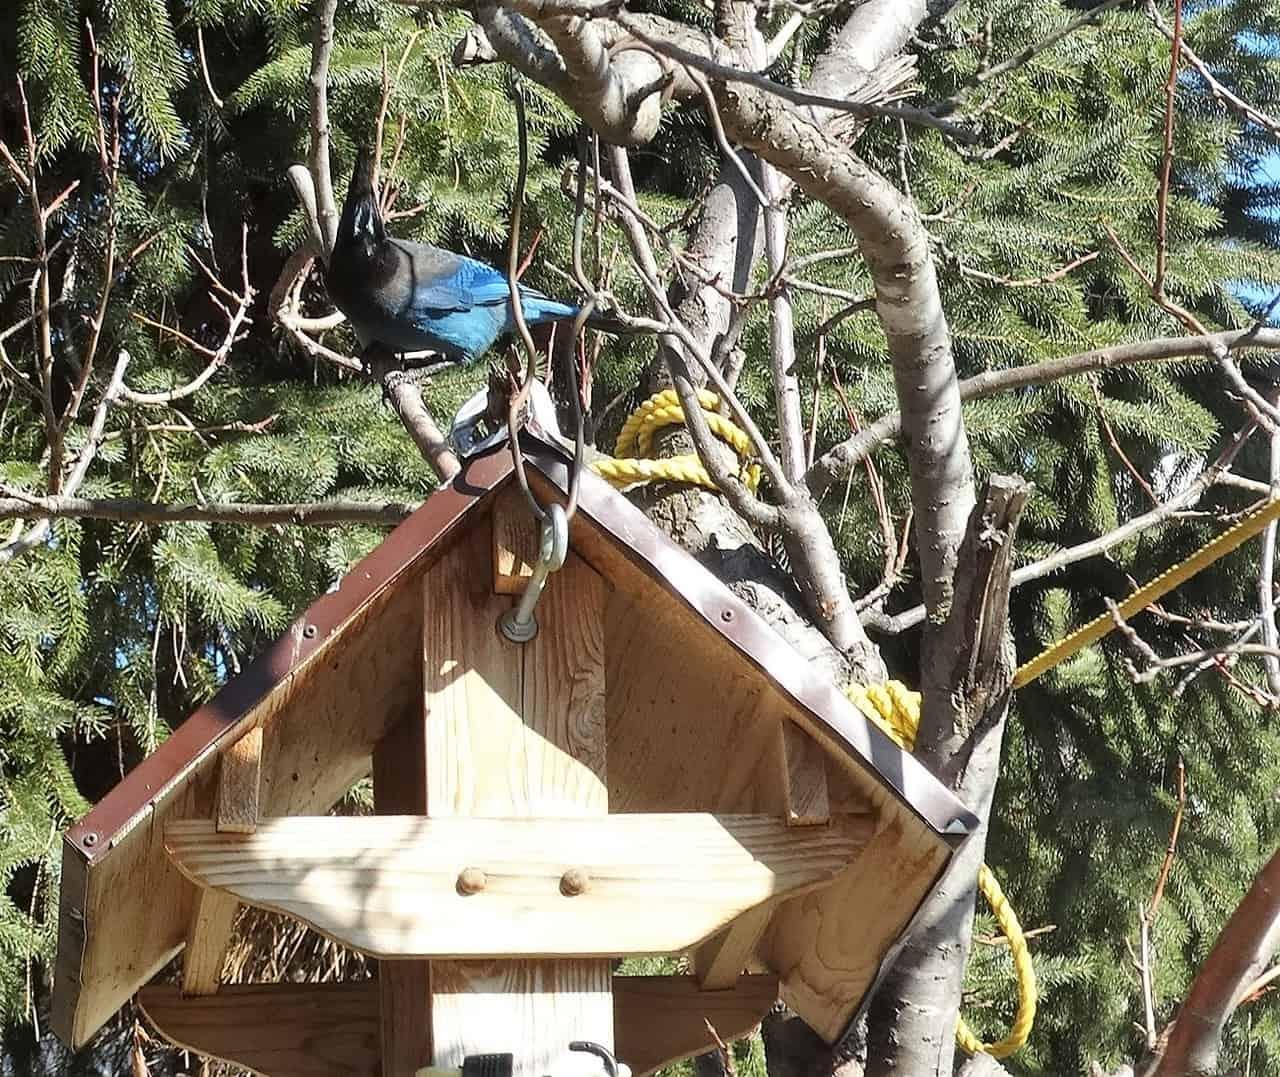 birdwatching in merritt bc canada